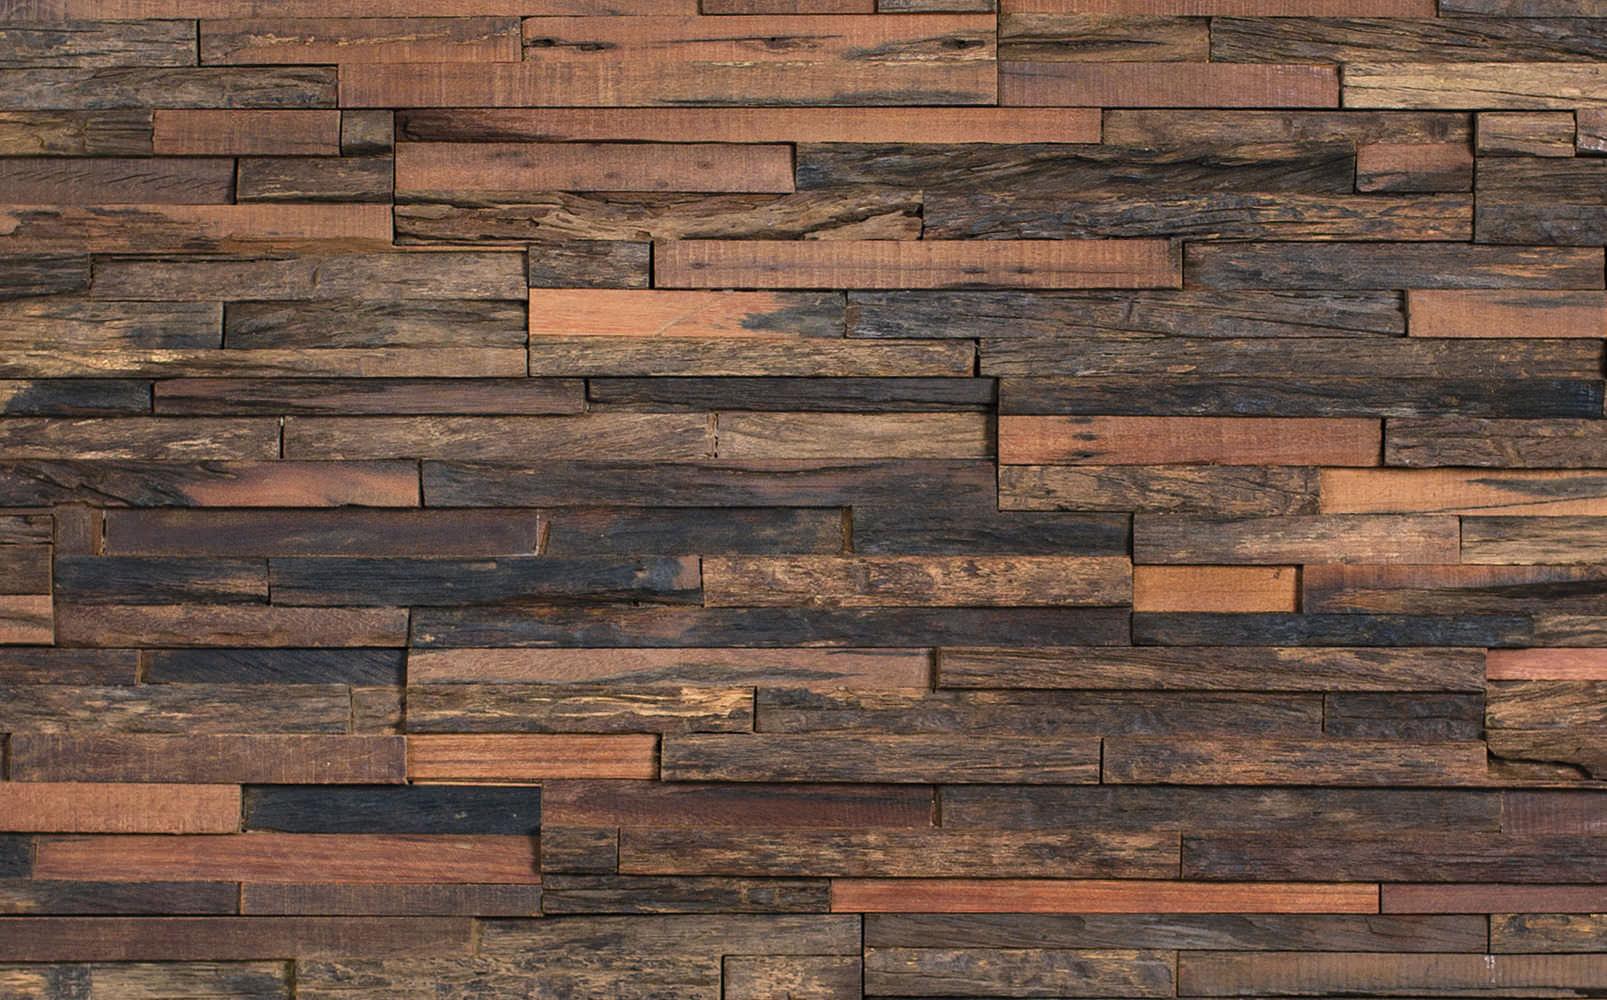 decorative wood wall panels designs photo - 1